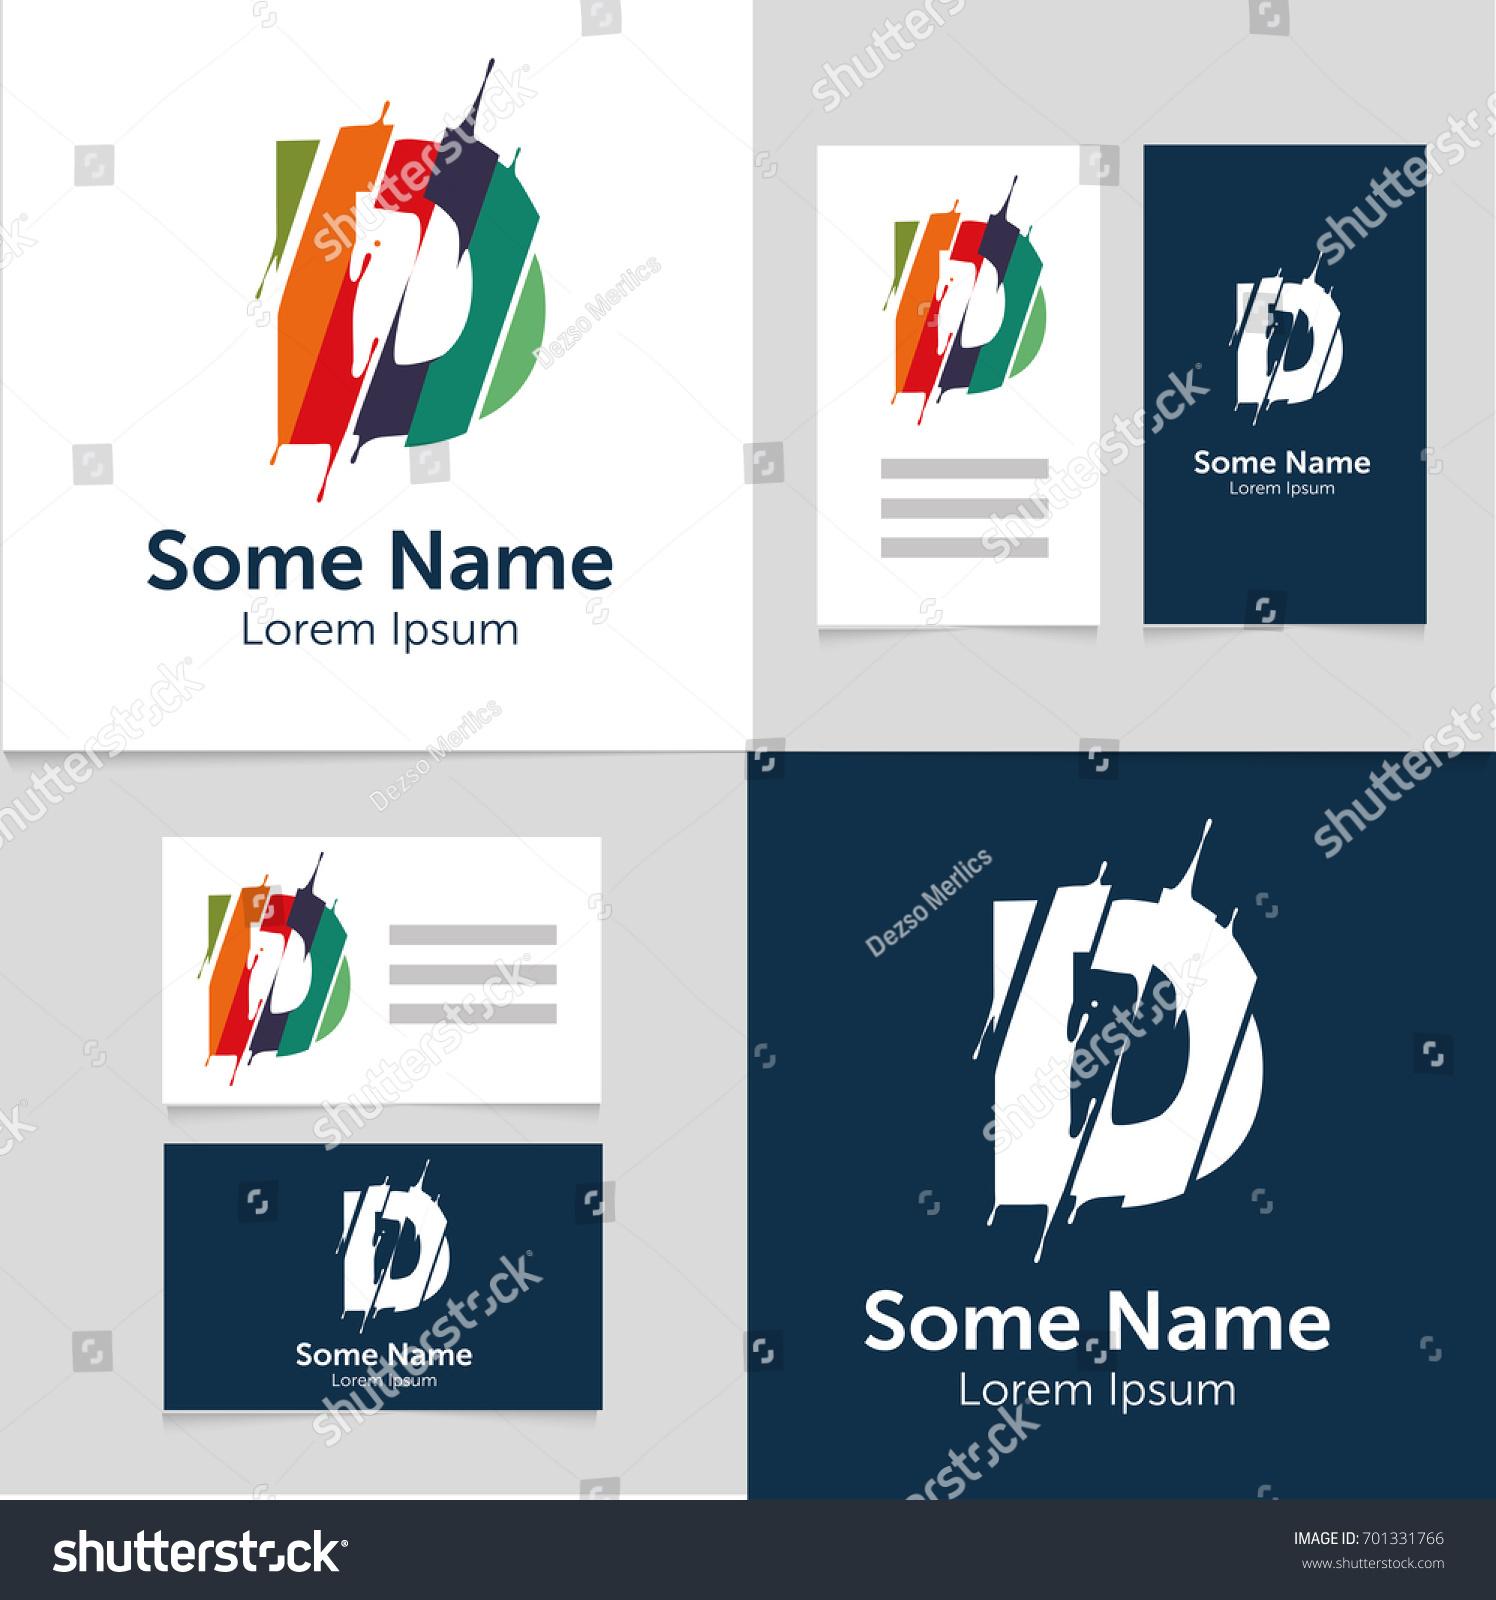 Editable d d character sheet timiznceptzmusic editable d d character sheet accmission Image collections